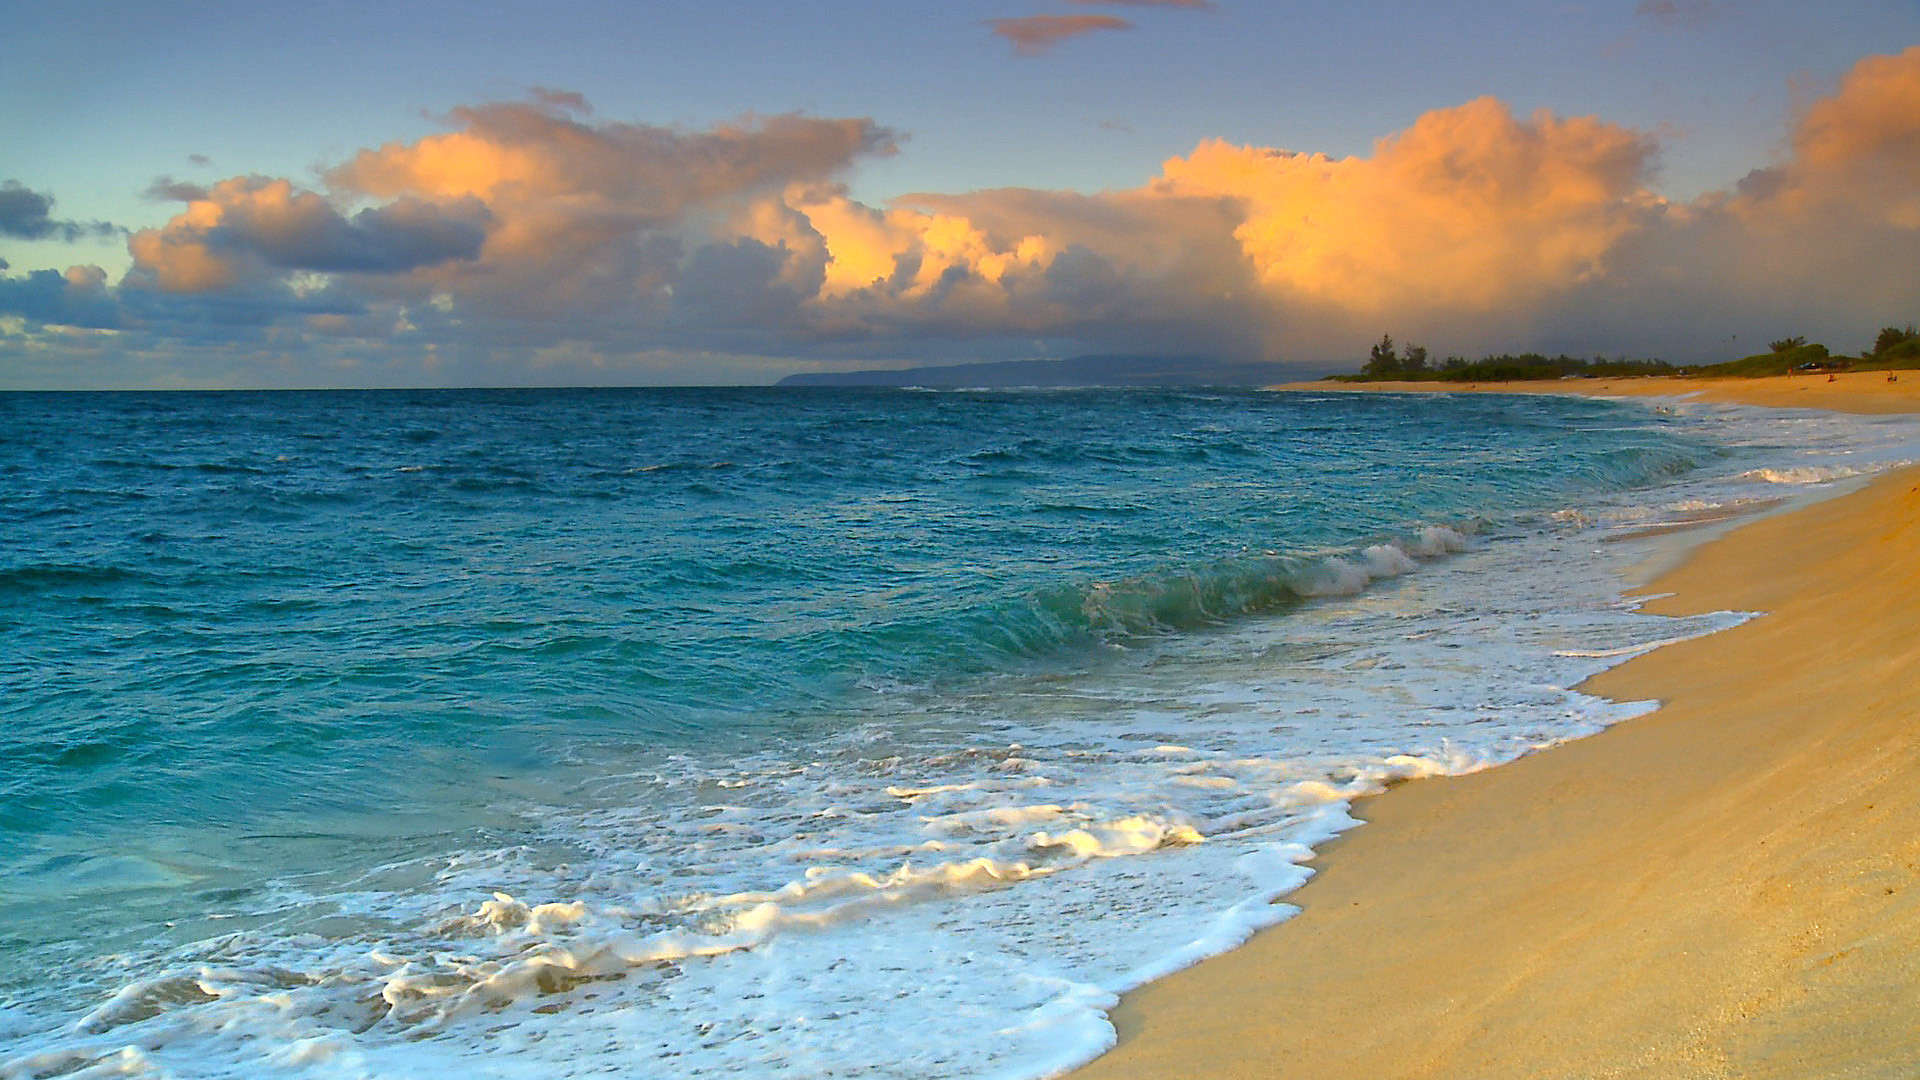 hawaii, photos, background, screensaver, beach, beaches, media .